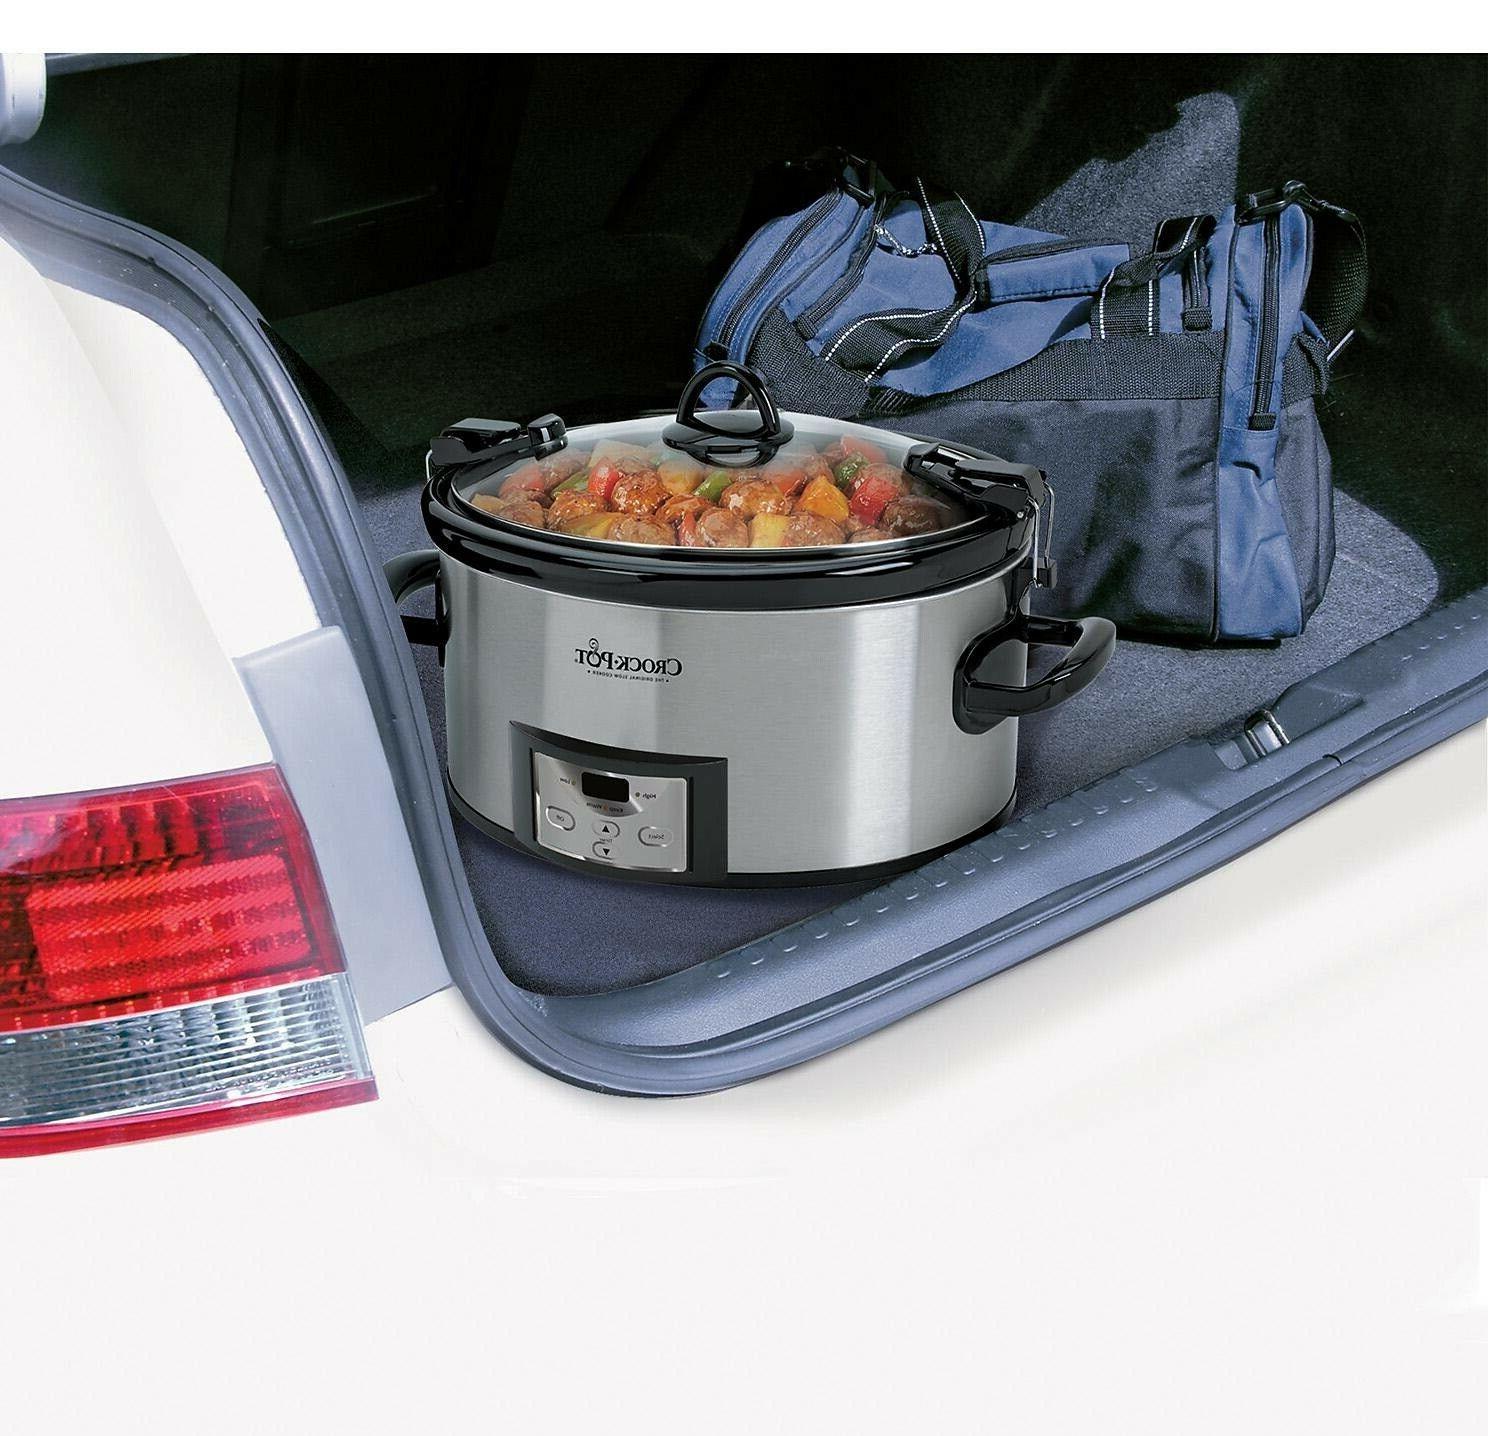 Crock-Pot Programmable Cook Carry 7 Quart Slow Cooker